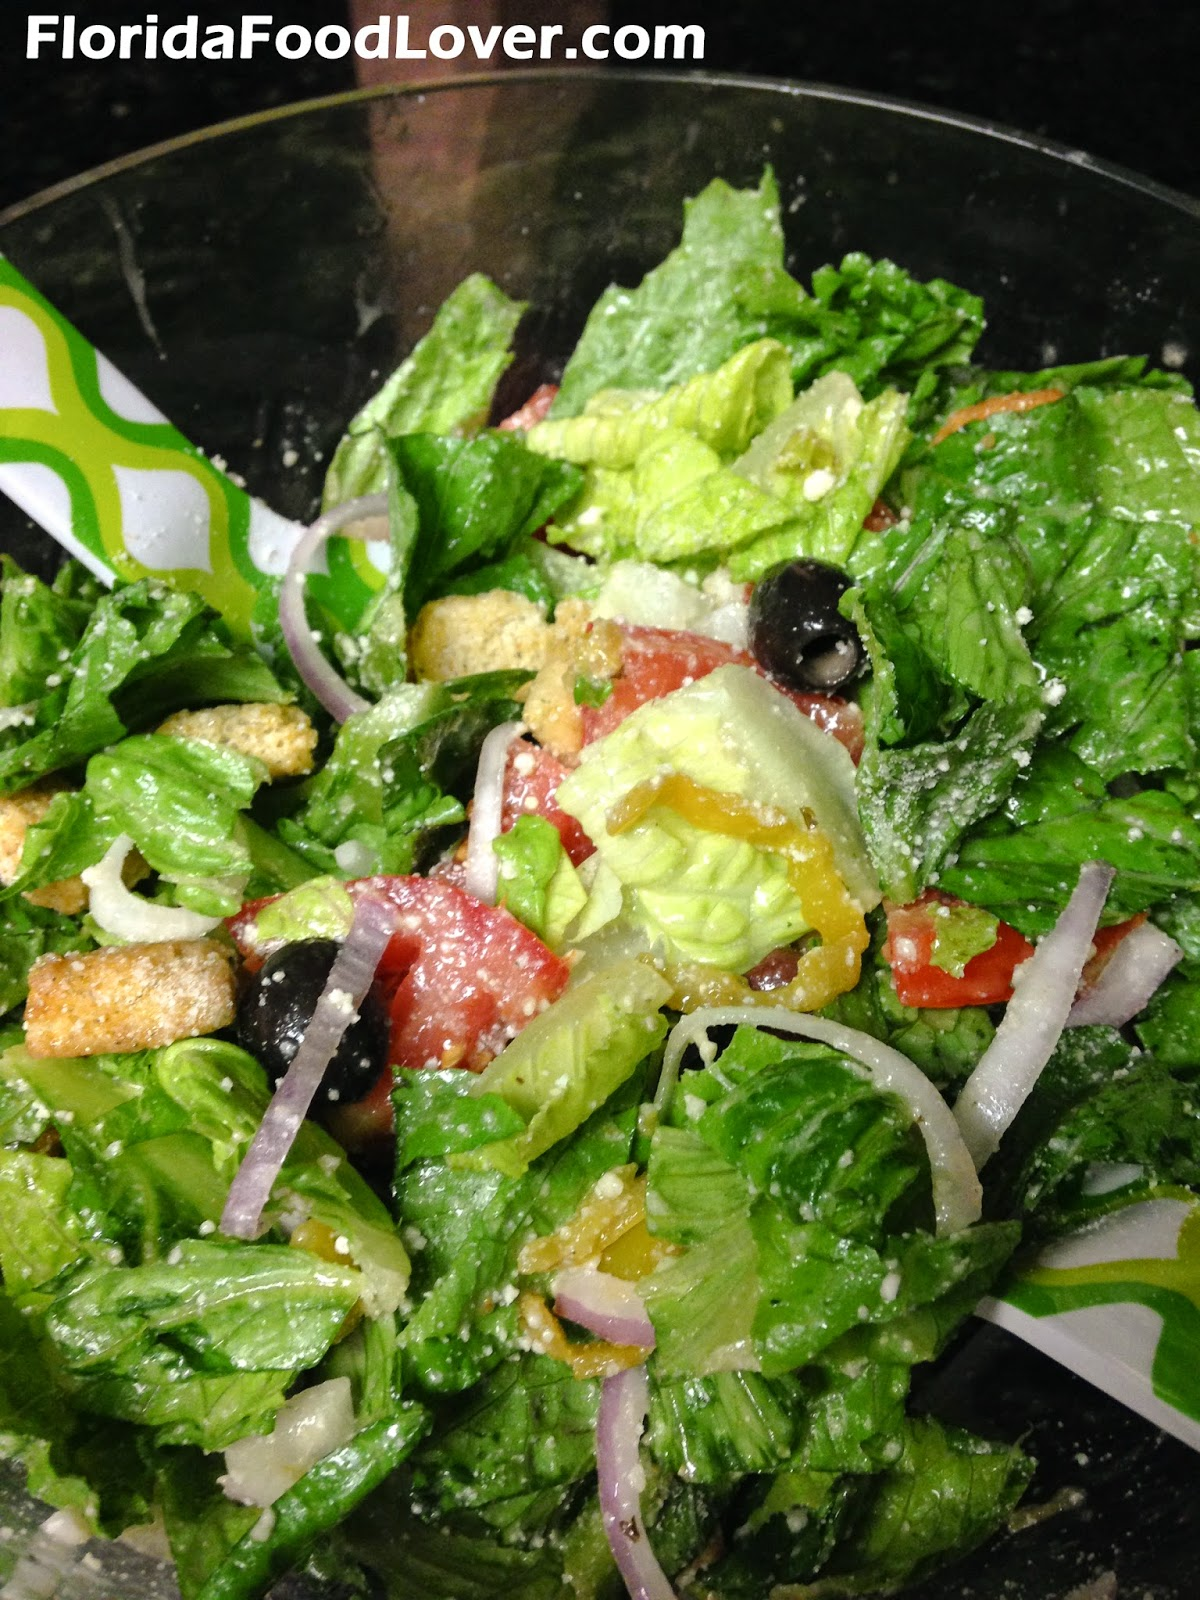 Florida Food Lover Copycat Olive Garden Salad